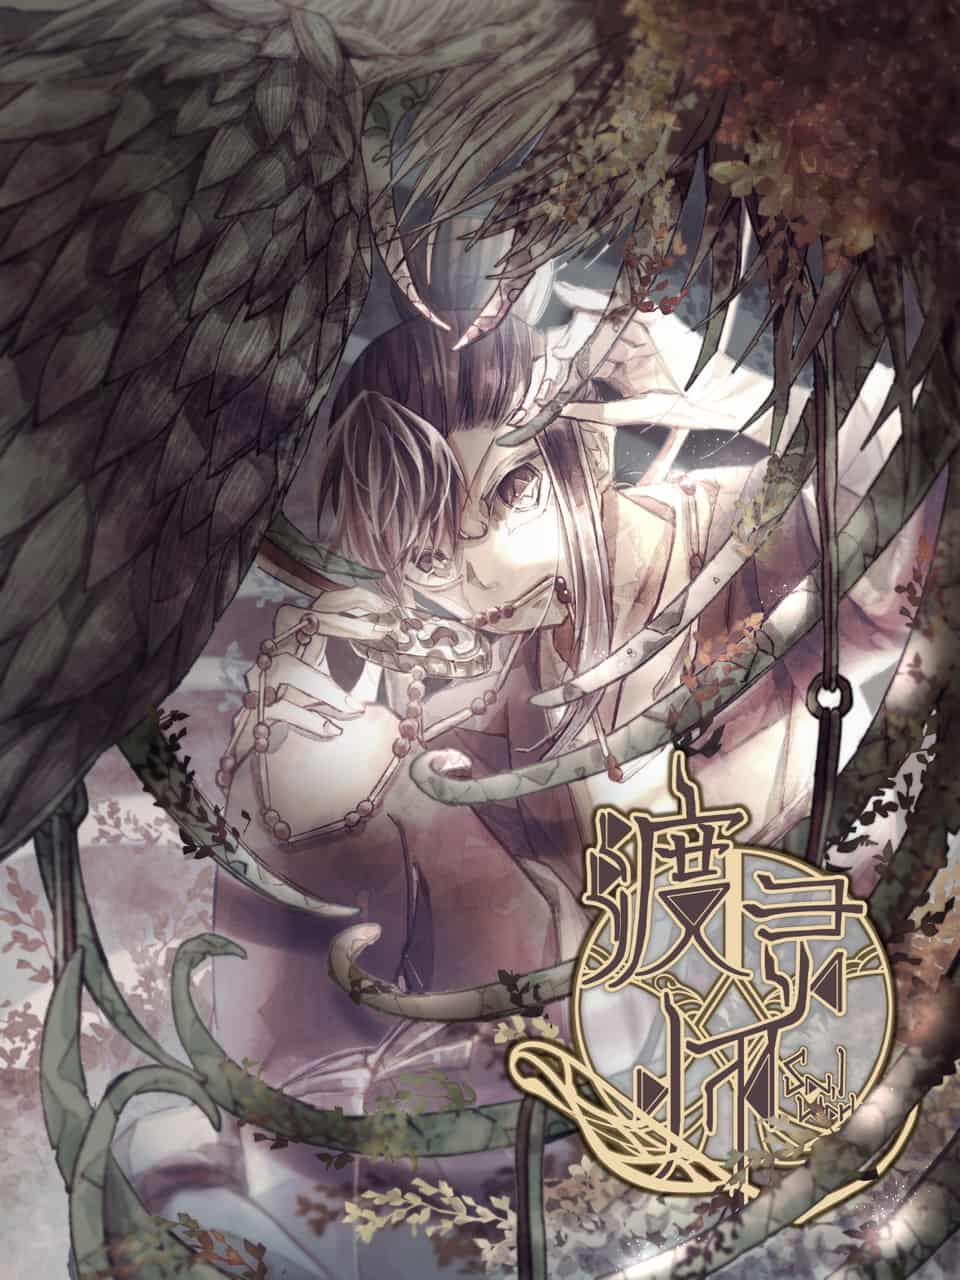 Soul worker  Illust of 竹川獅 art painting 原創角色 原創漫畫 original illustration 原創人物 Artwork